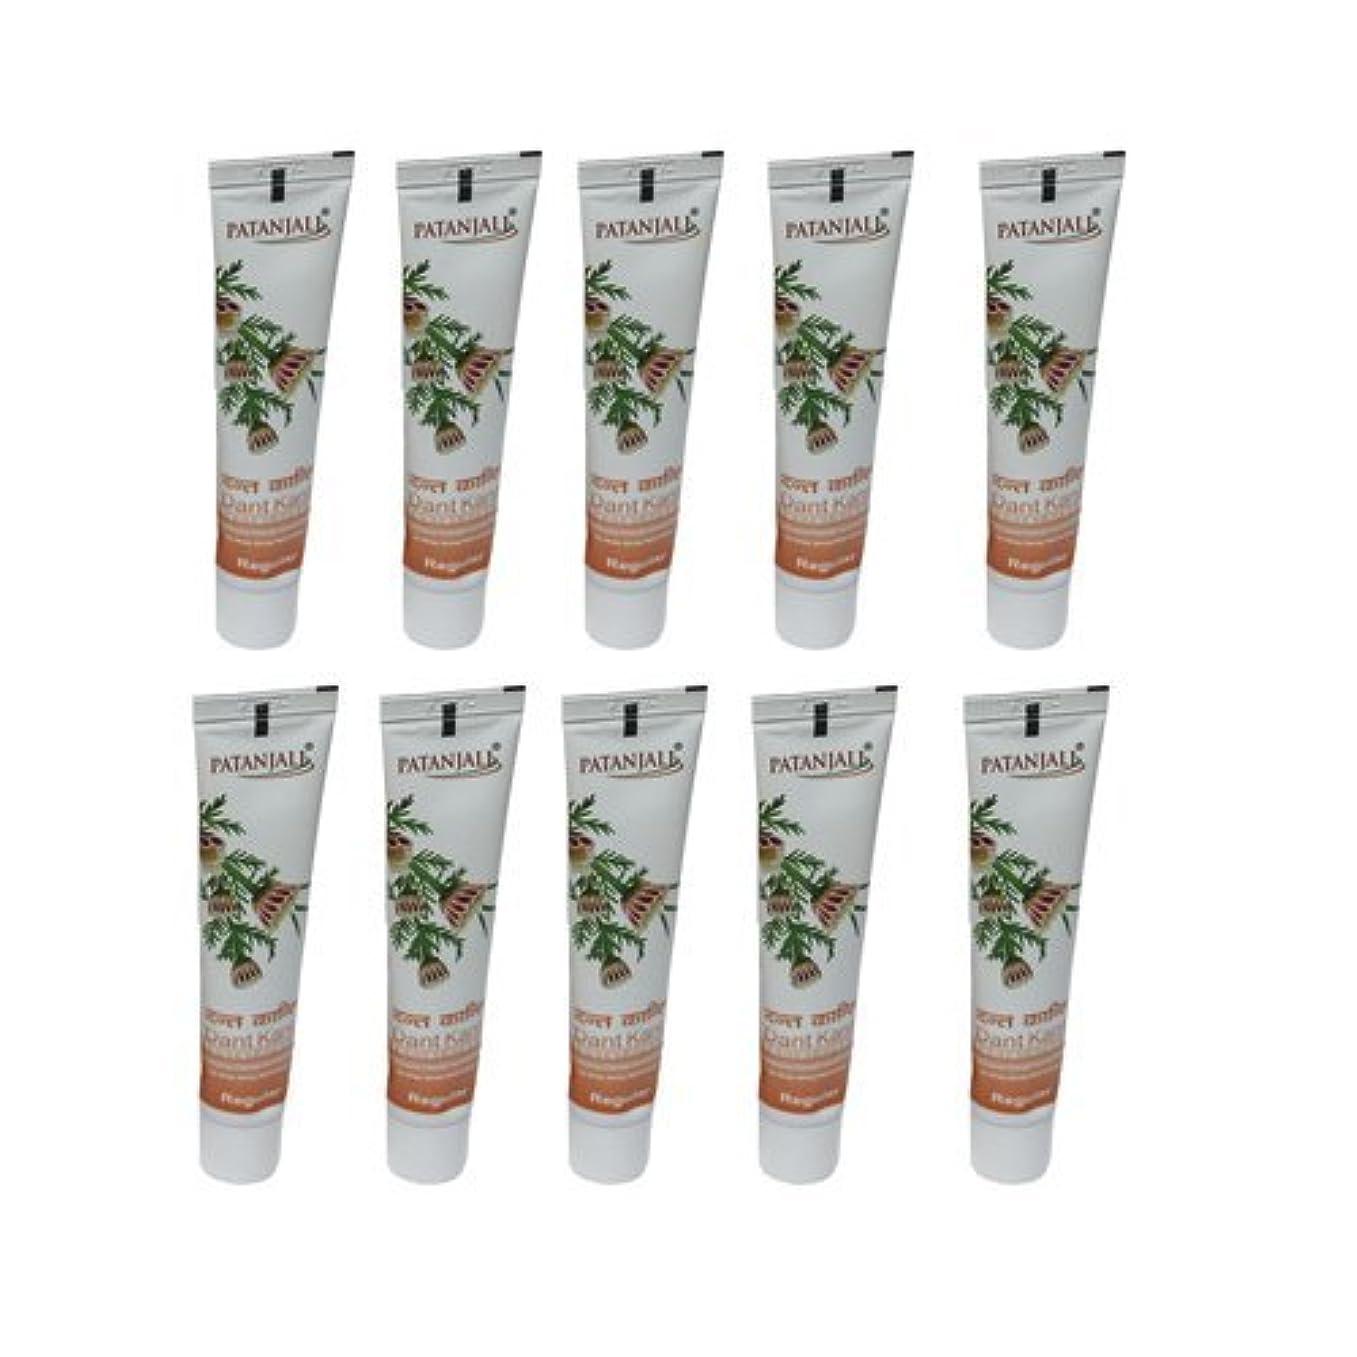 10 x Patanjali Dant Kanti Toothpaste Dental Cream 100gm (Pack of 10) [並行輸入品]